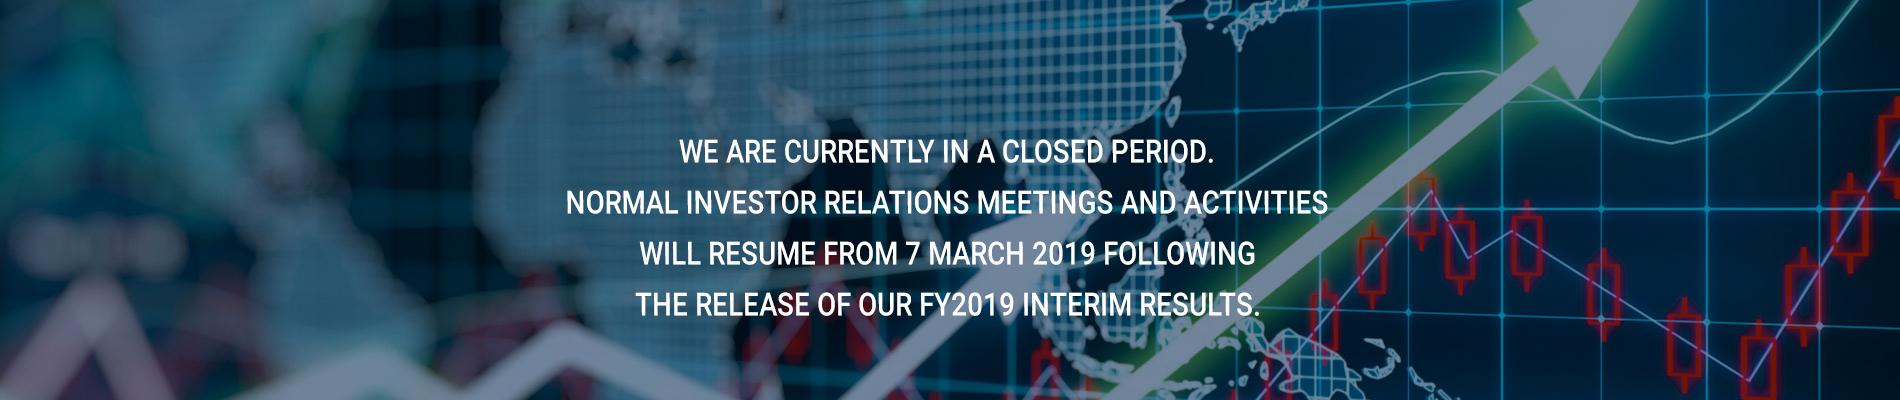 investors-2019-2